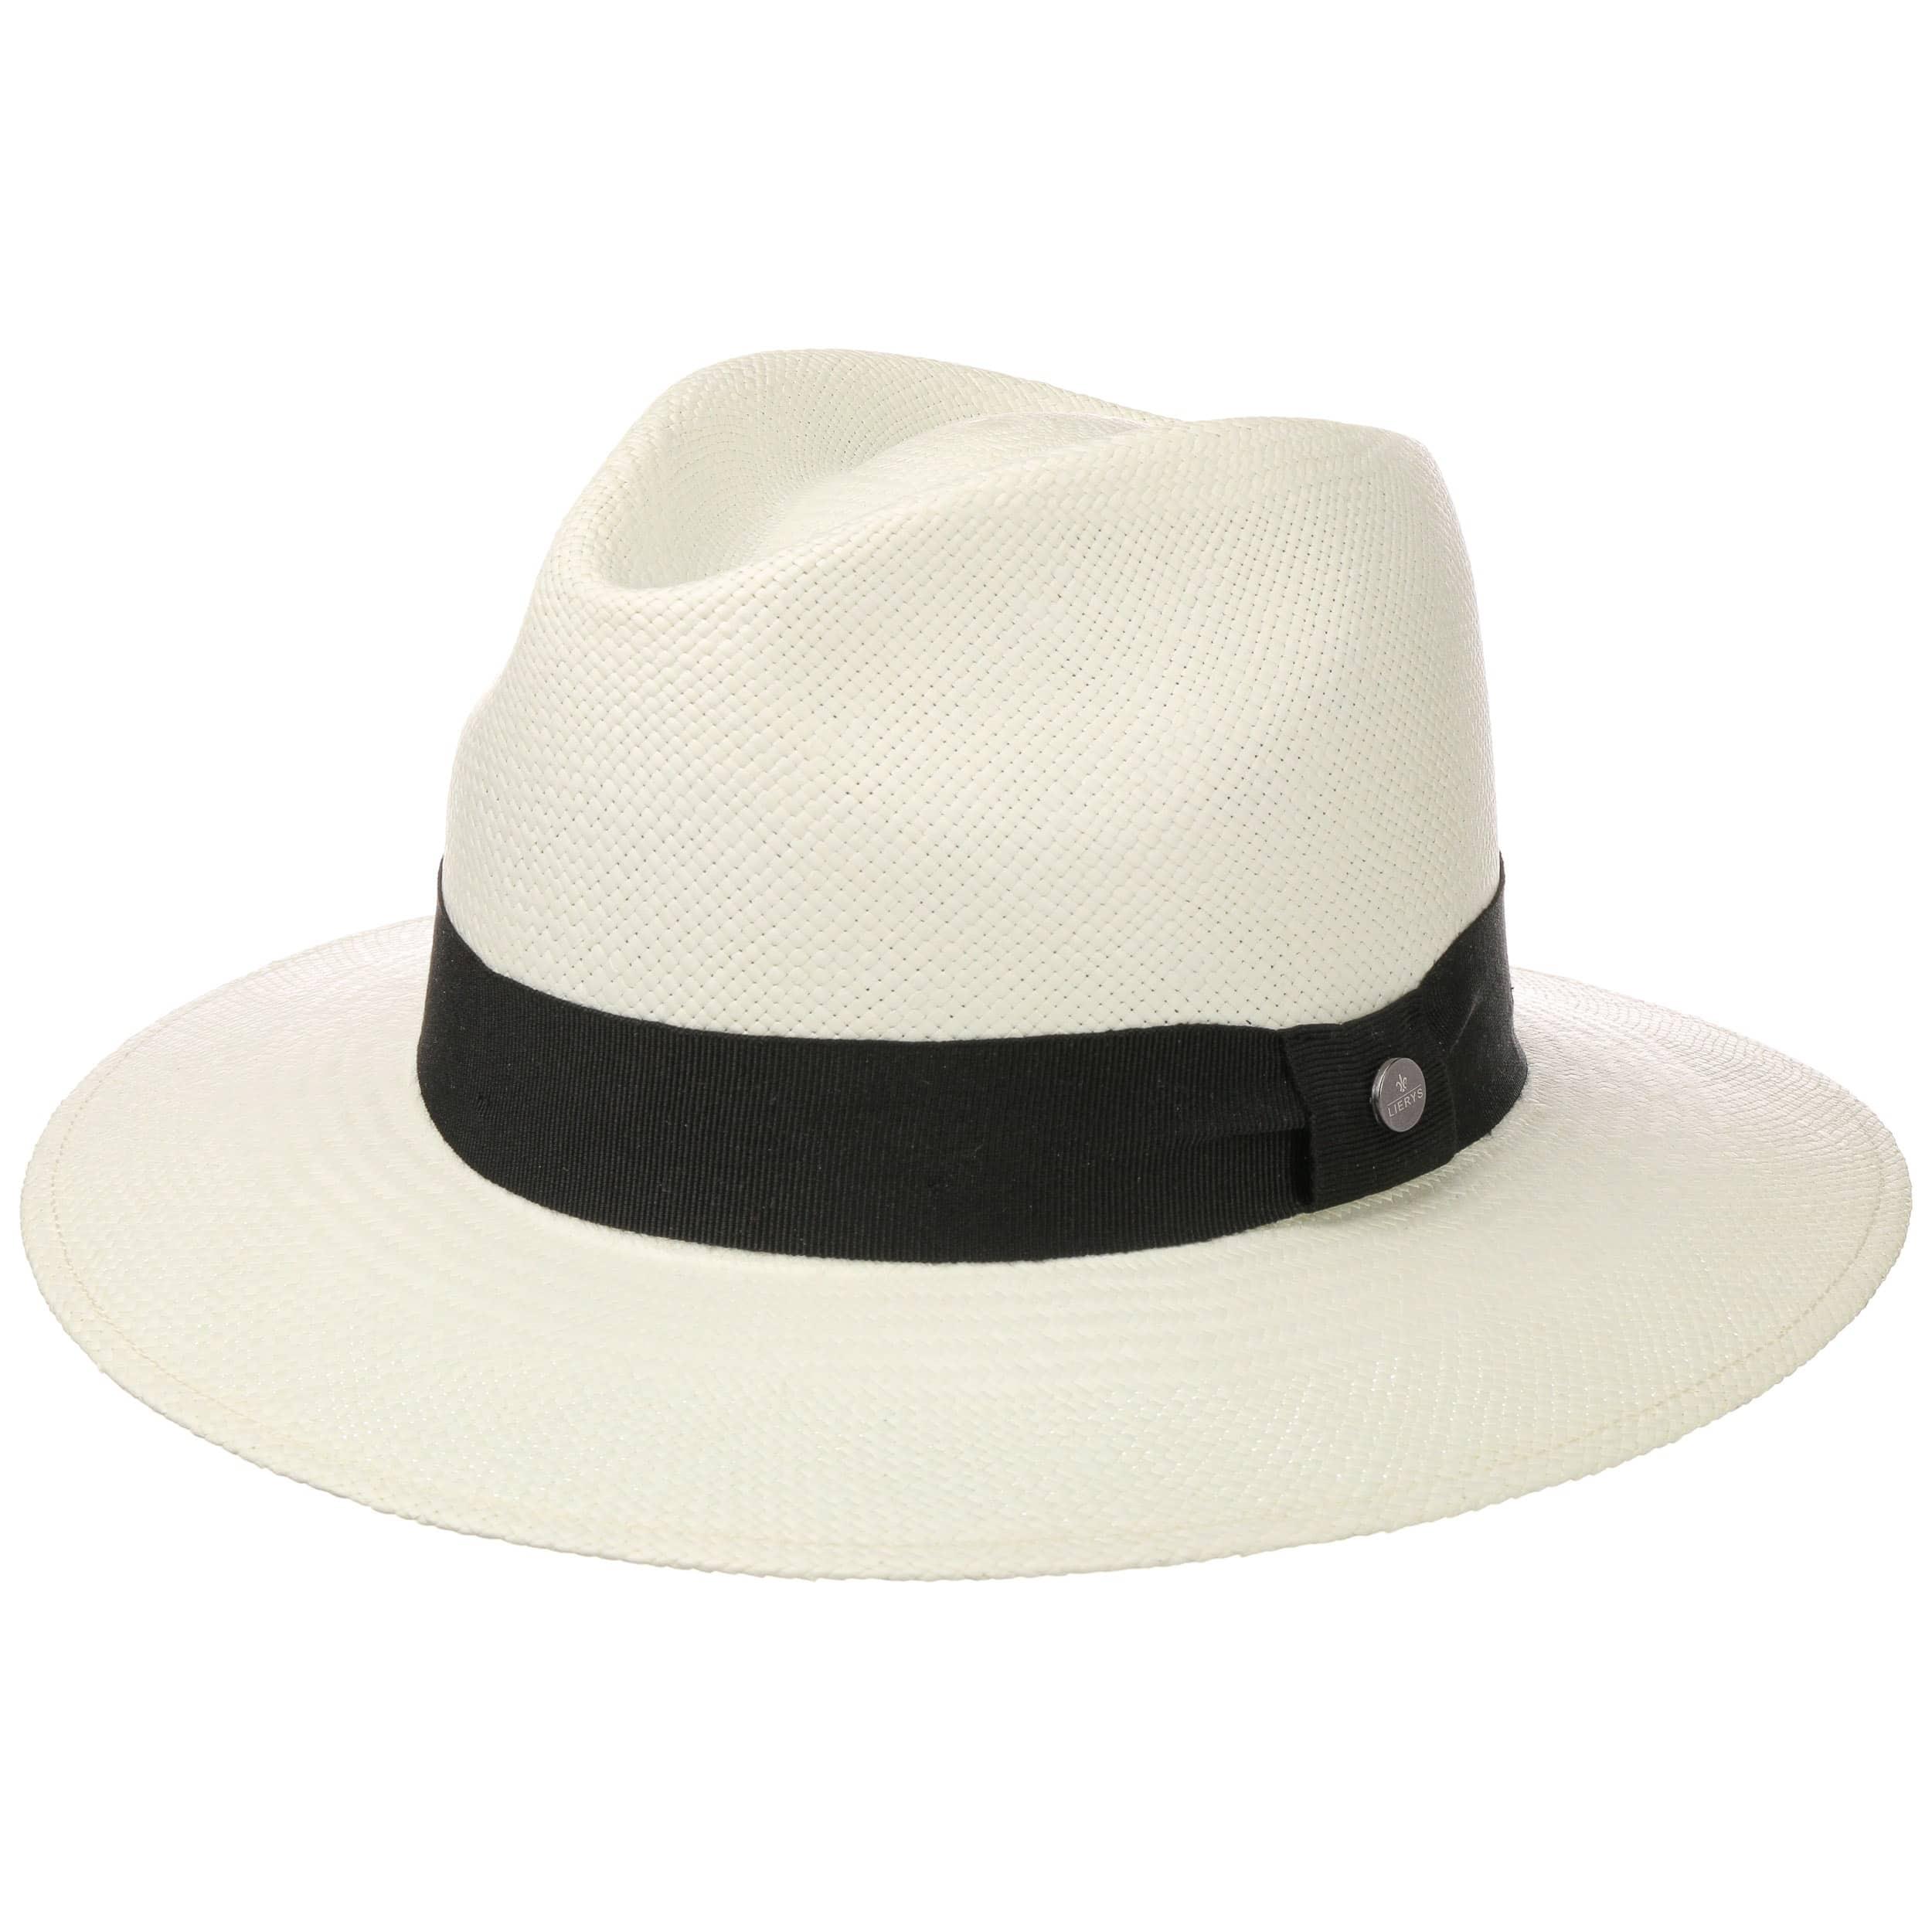 Georgo cappello panama lierys bianco nero jpg 2500x2500 Cappello panama  bianco 15b3f4992d24